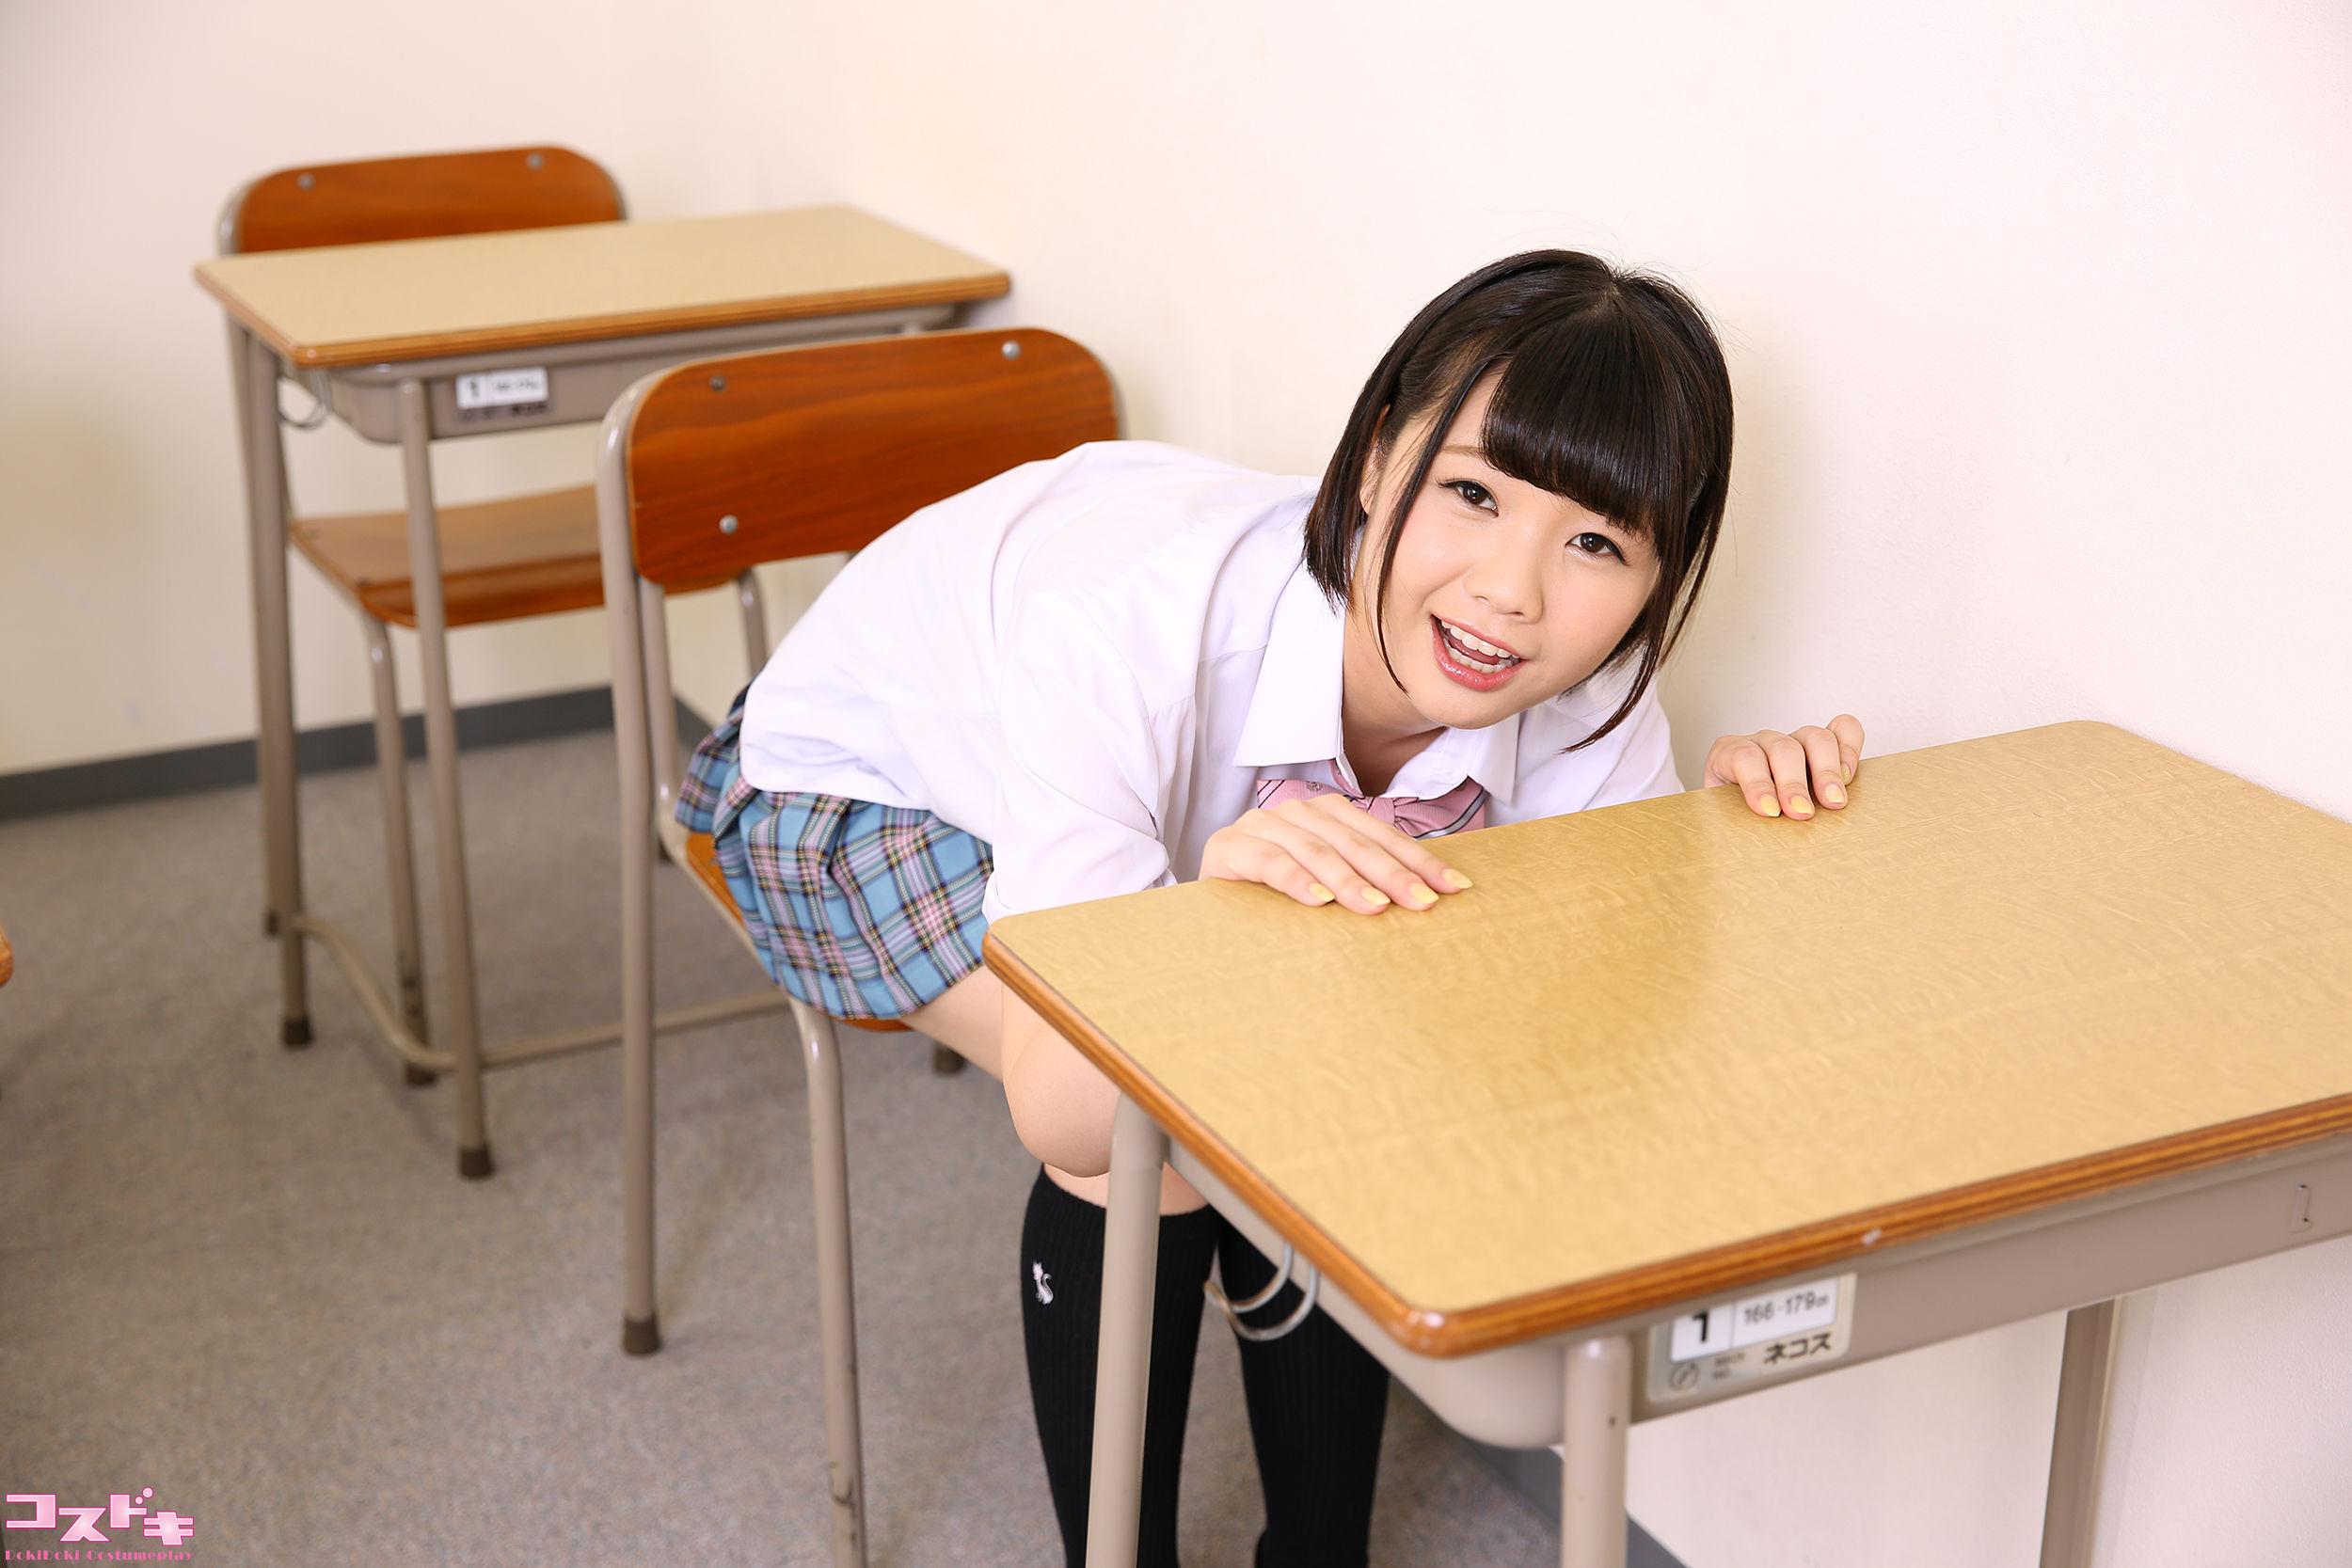 VOL.463 [Cosdoki]学生装:雏菊翼(雛菊つばさ)超高清写真套图(70P)